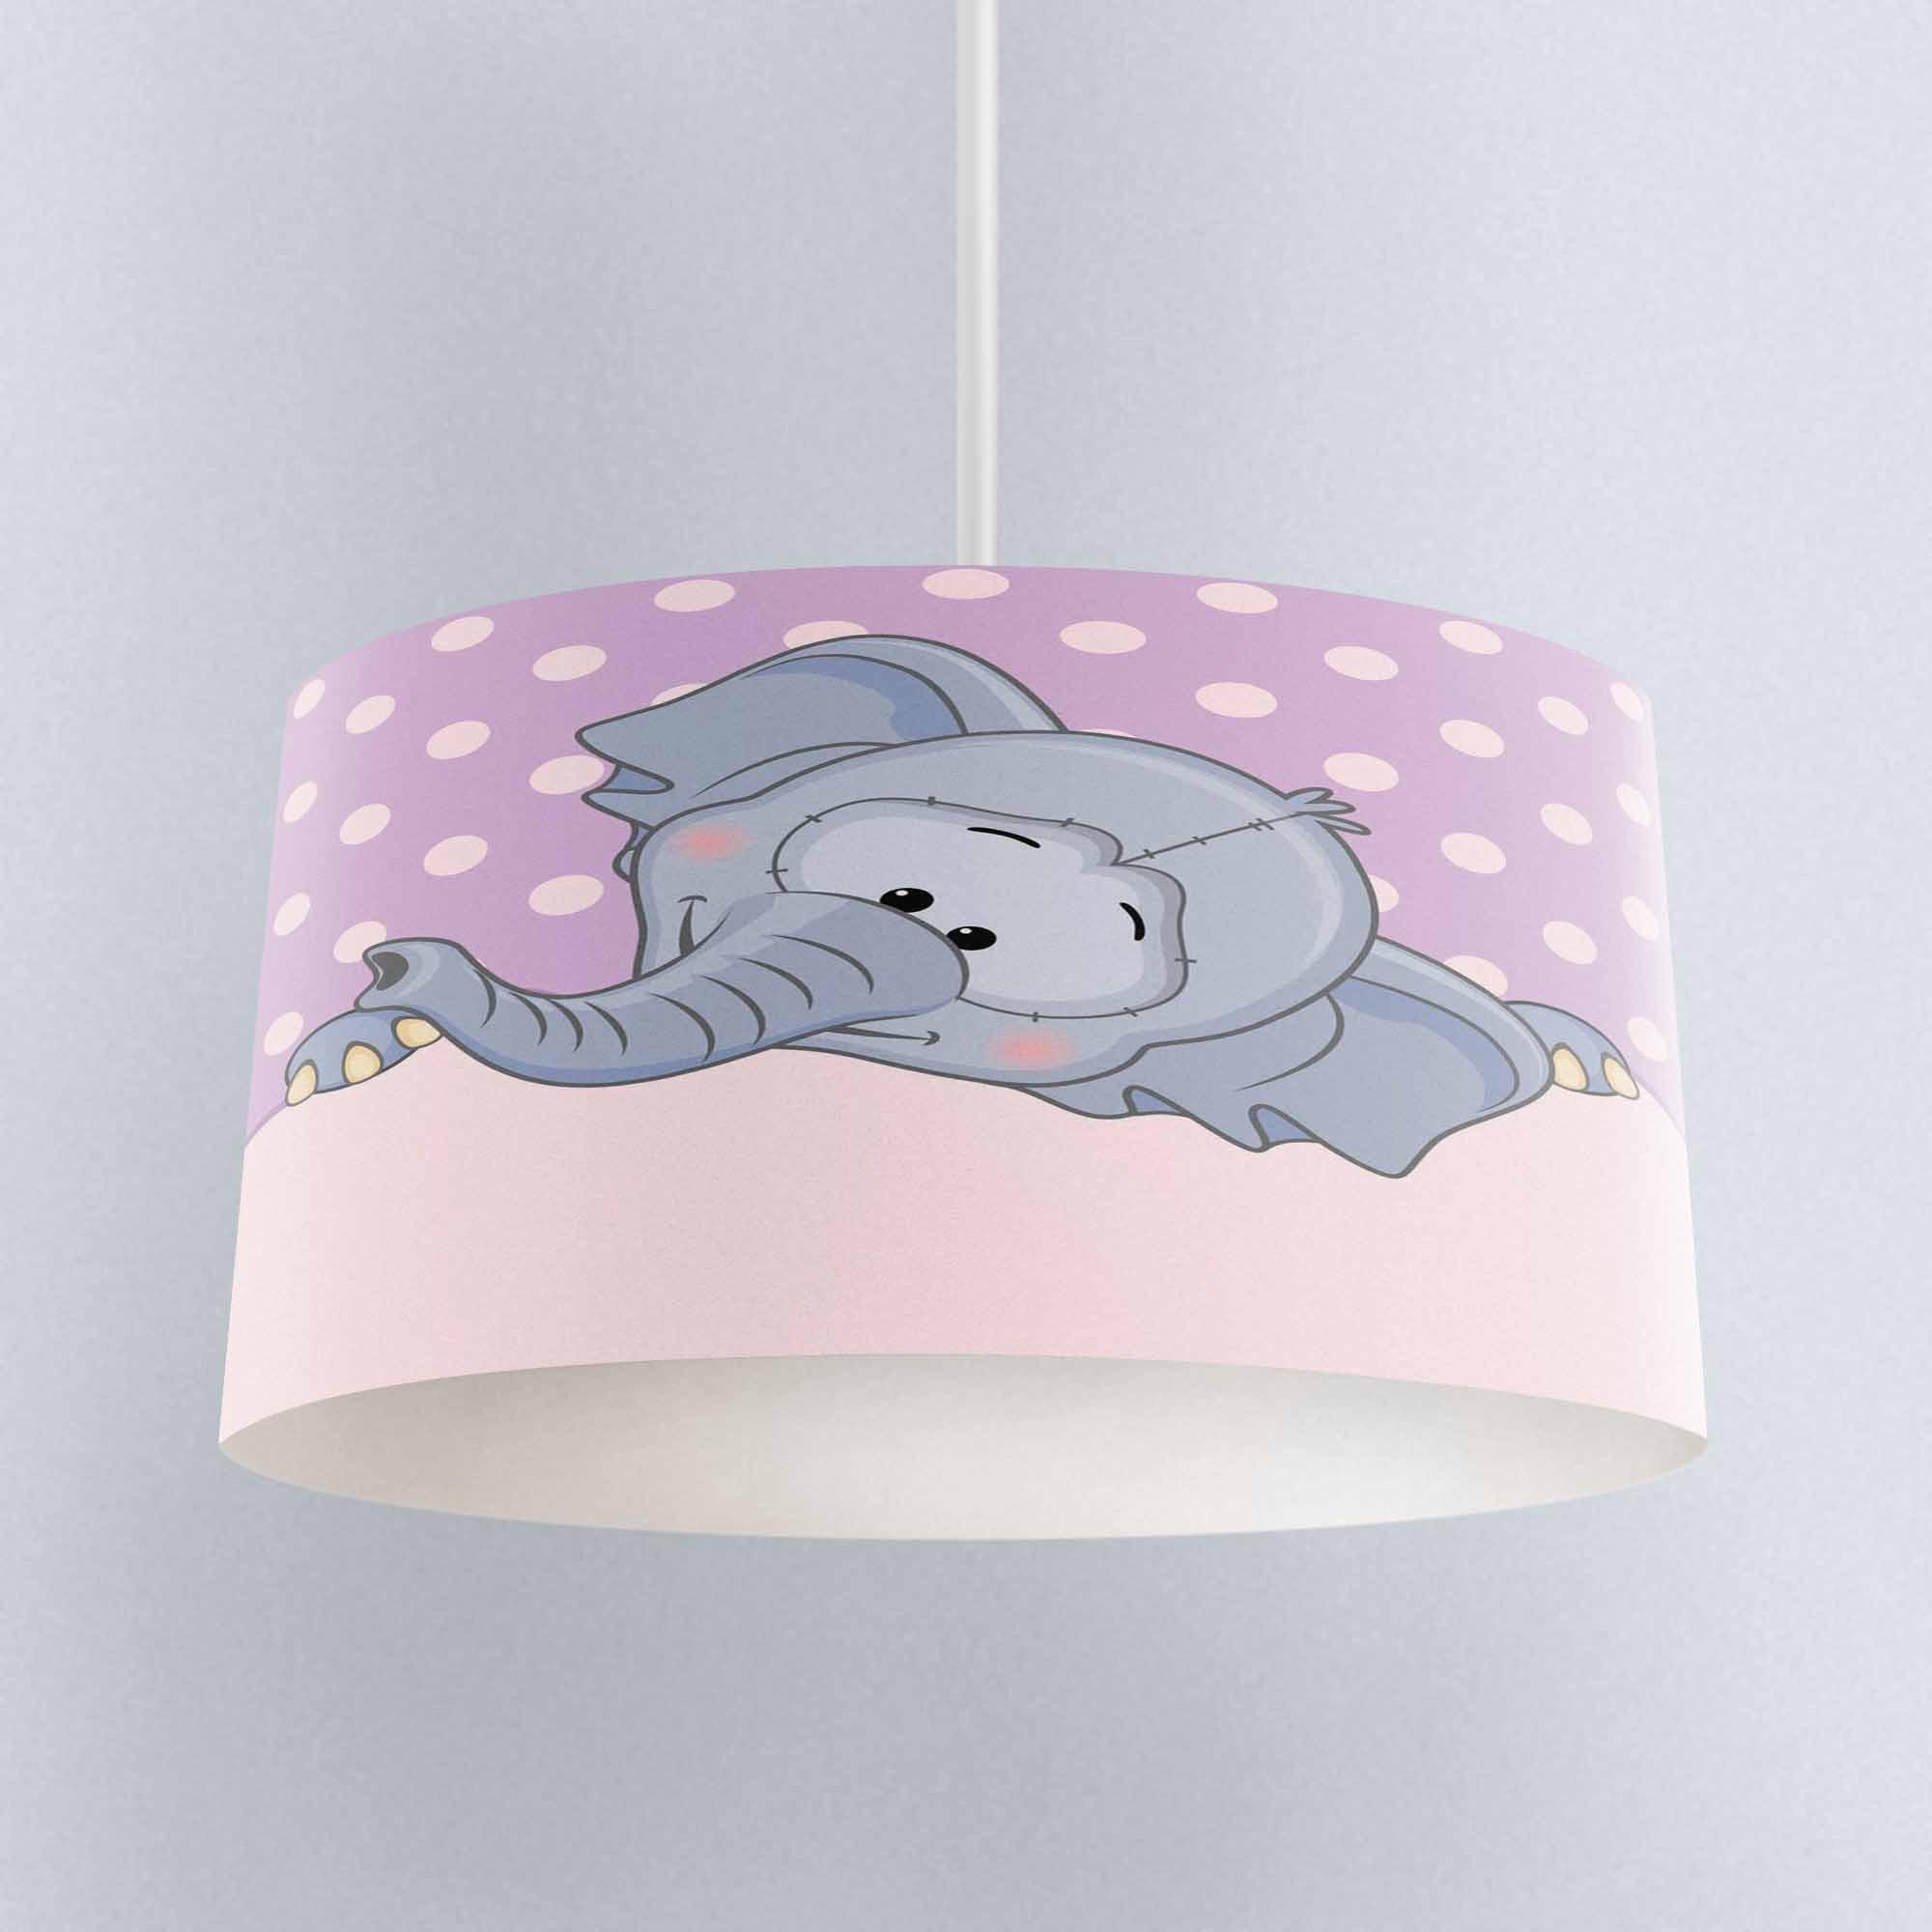 Else Purple Floor White Dots Gray Elephant Print Fabric Kids Chandelier Lamp Drum Lampshade Floor Ceiling Pendant Light Shade